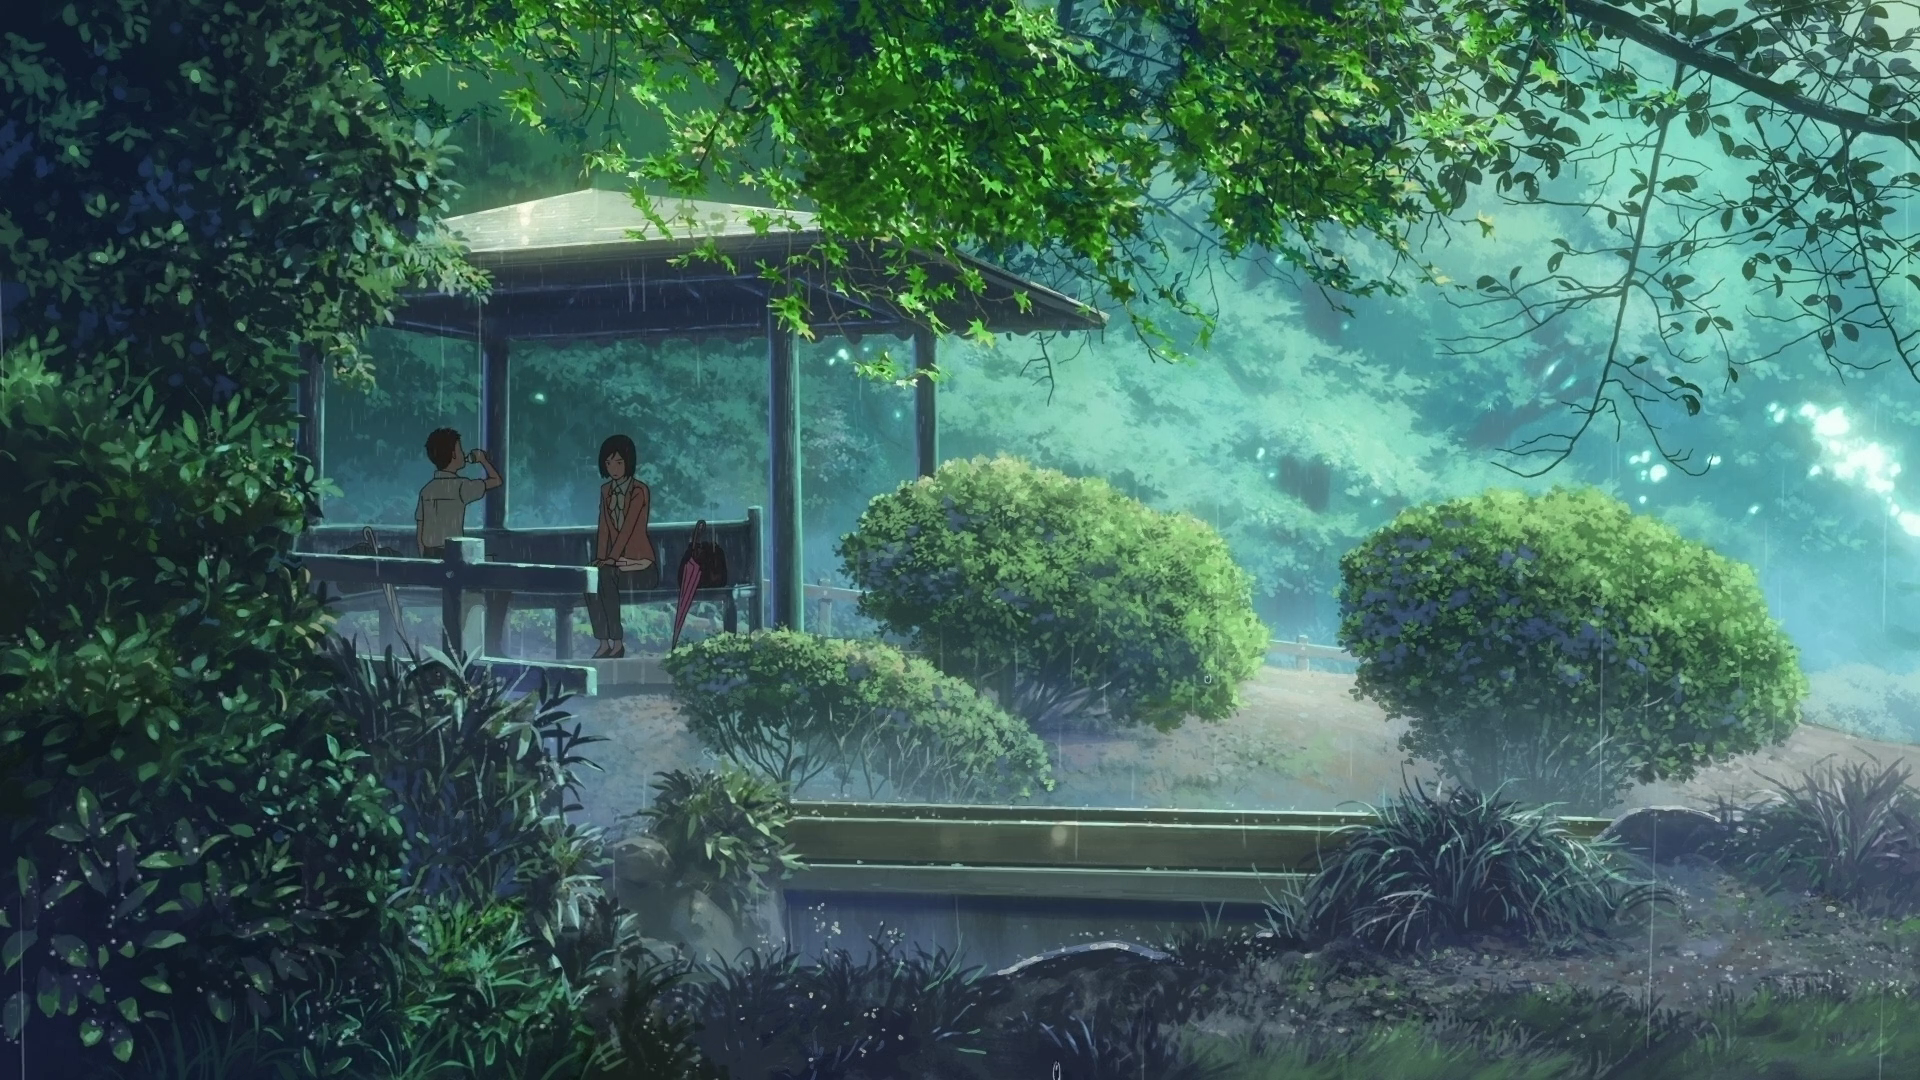 Download bdrip 1080p h264 jap aac hardsub ita - Oltre il giardino torrent ita ...